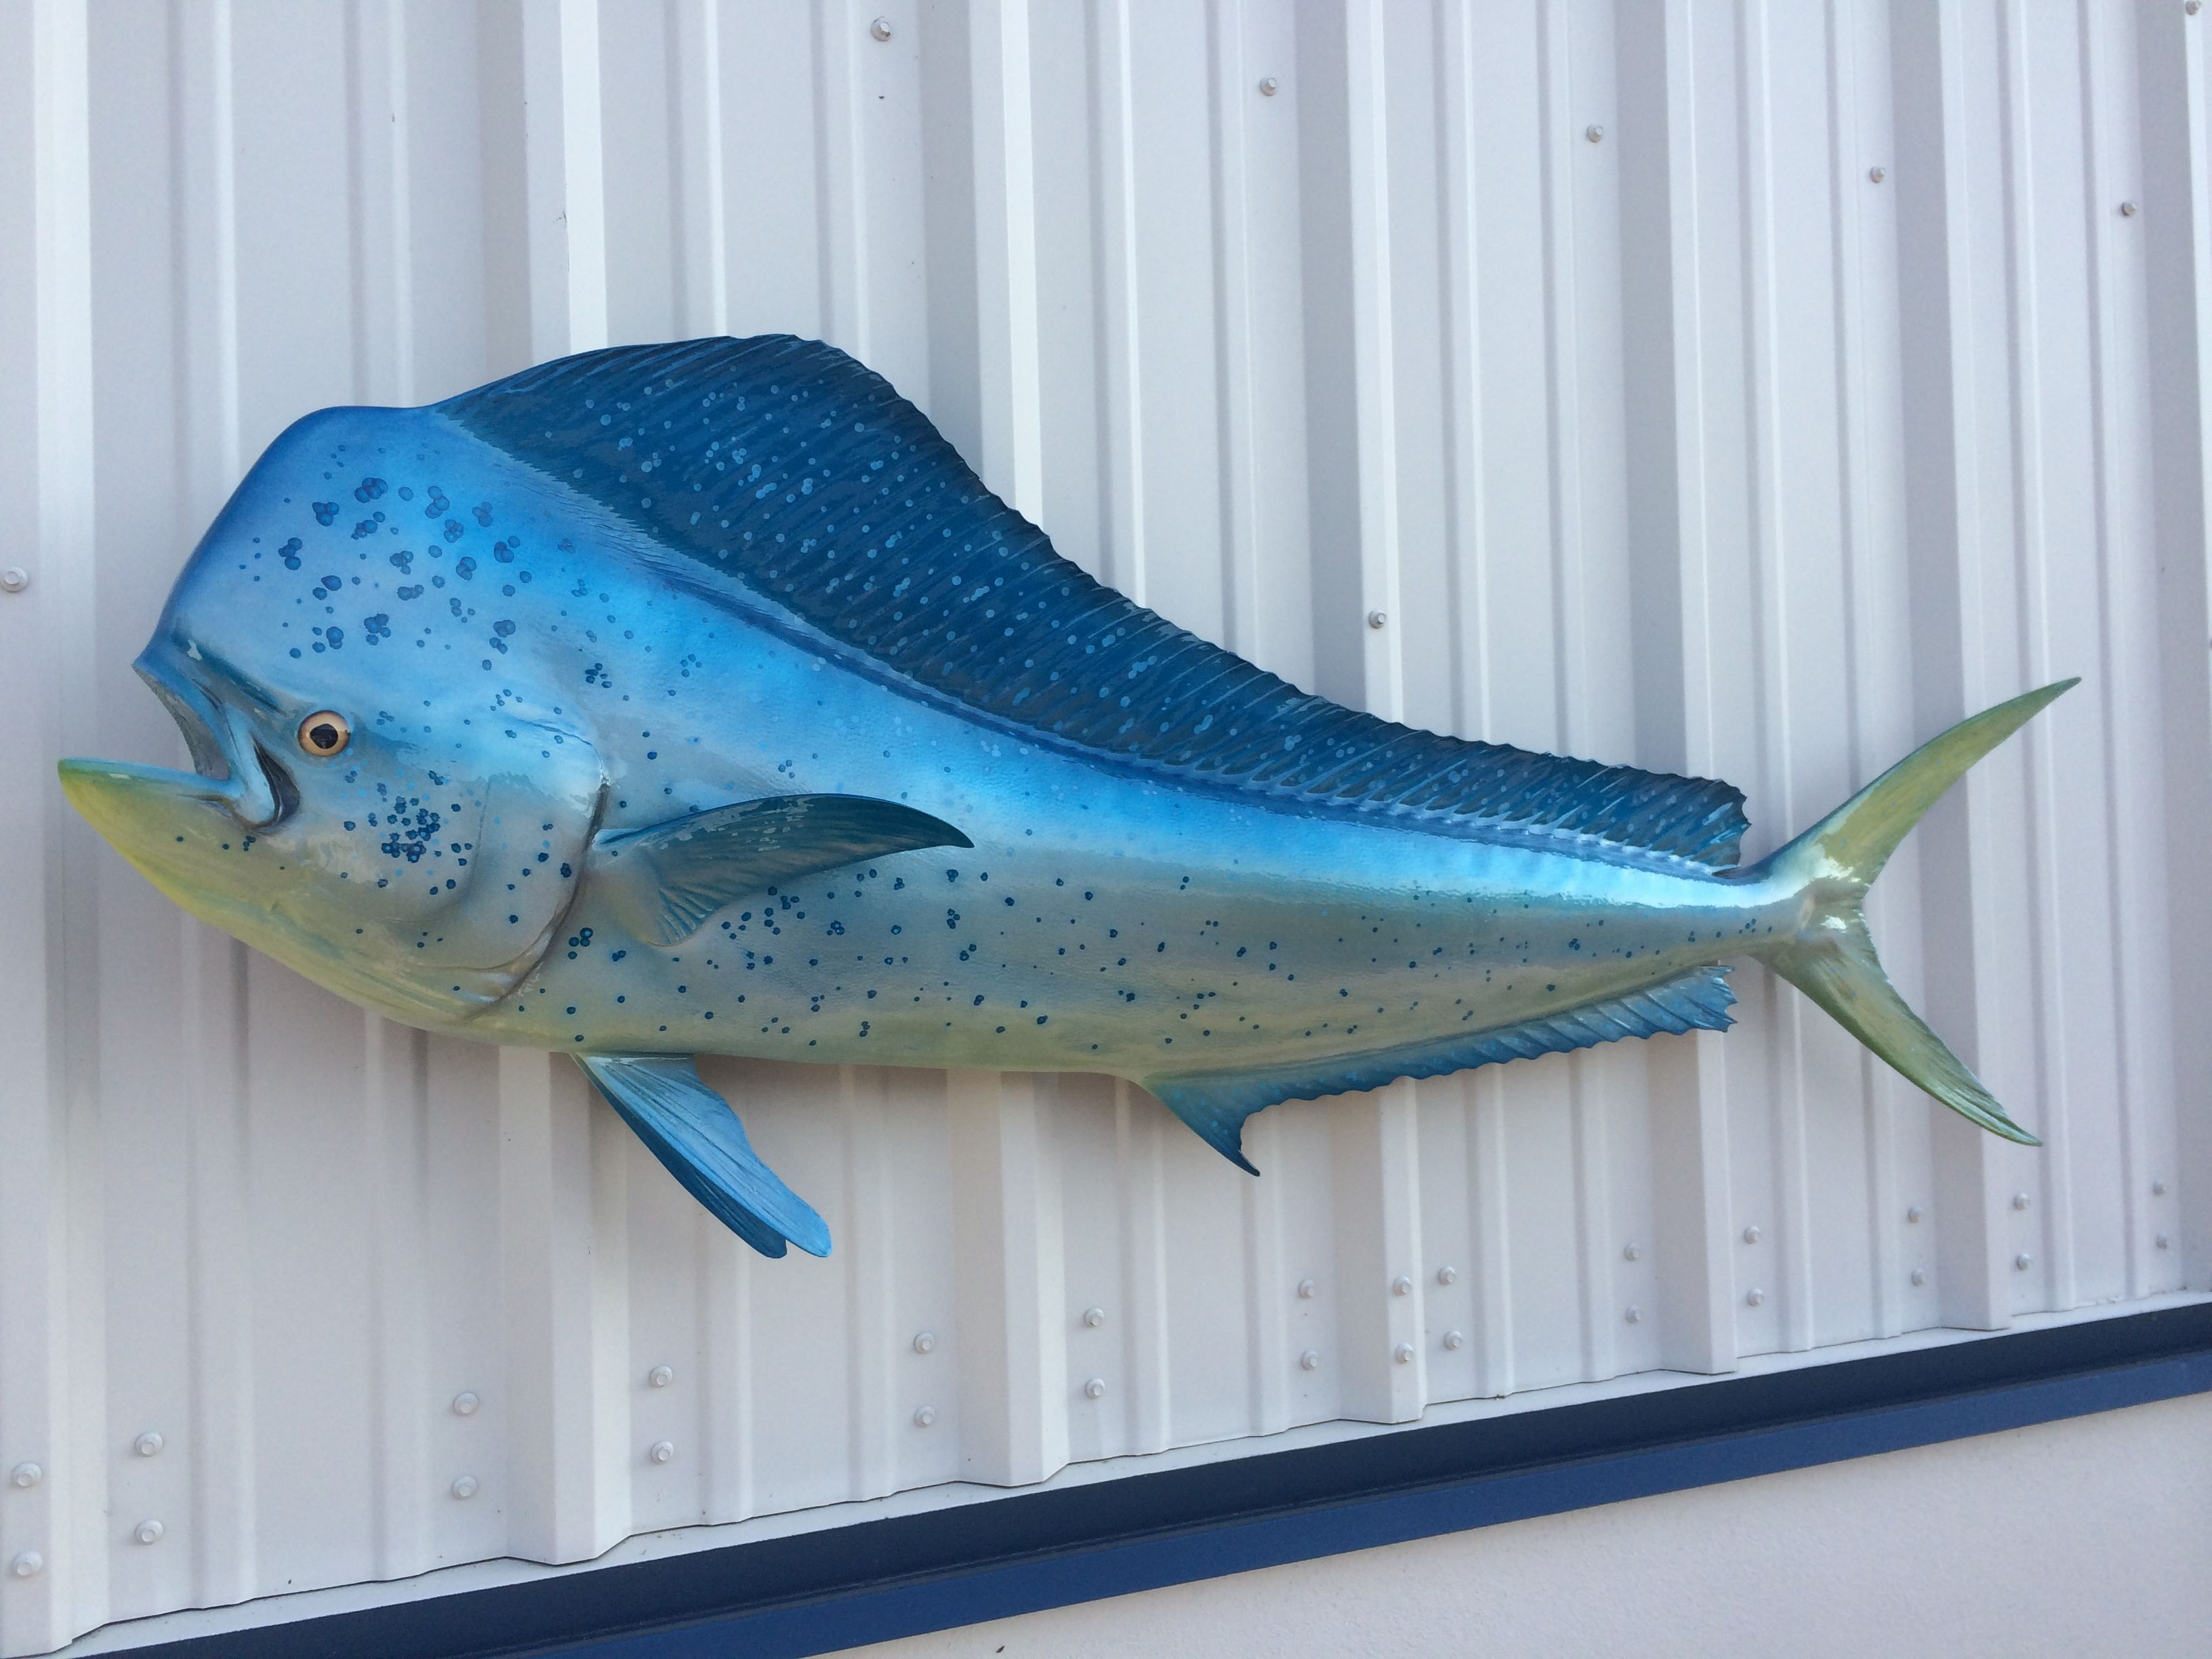 Electric blue dorado aka bull dolphin or mahi mahi 62 for Mahi mahi fish